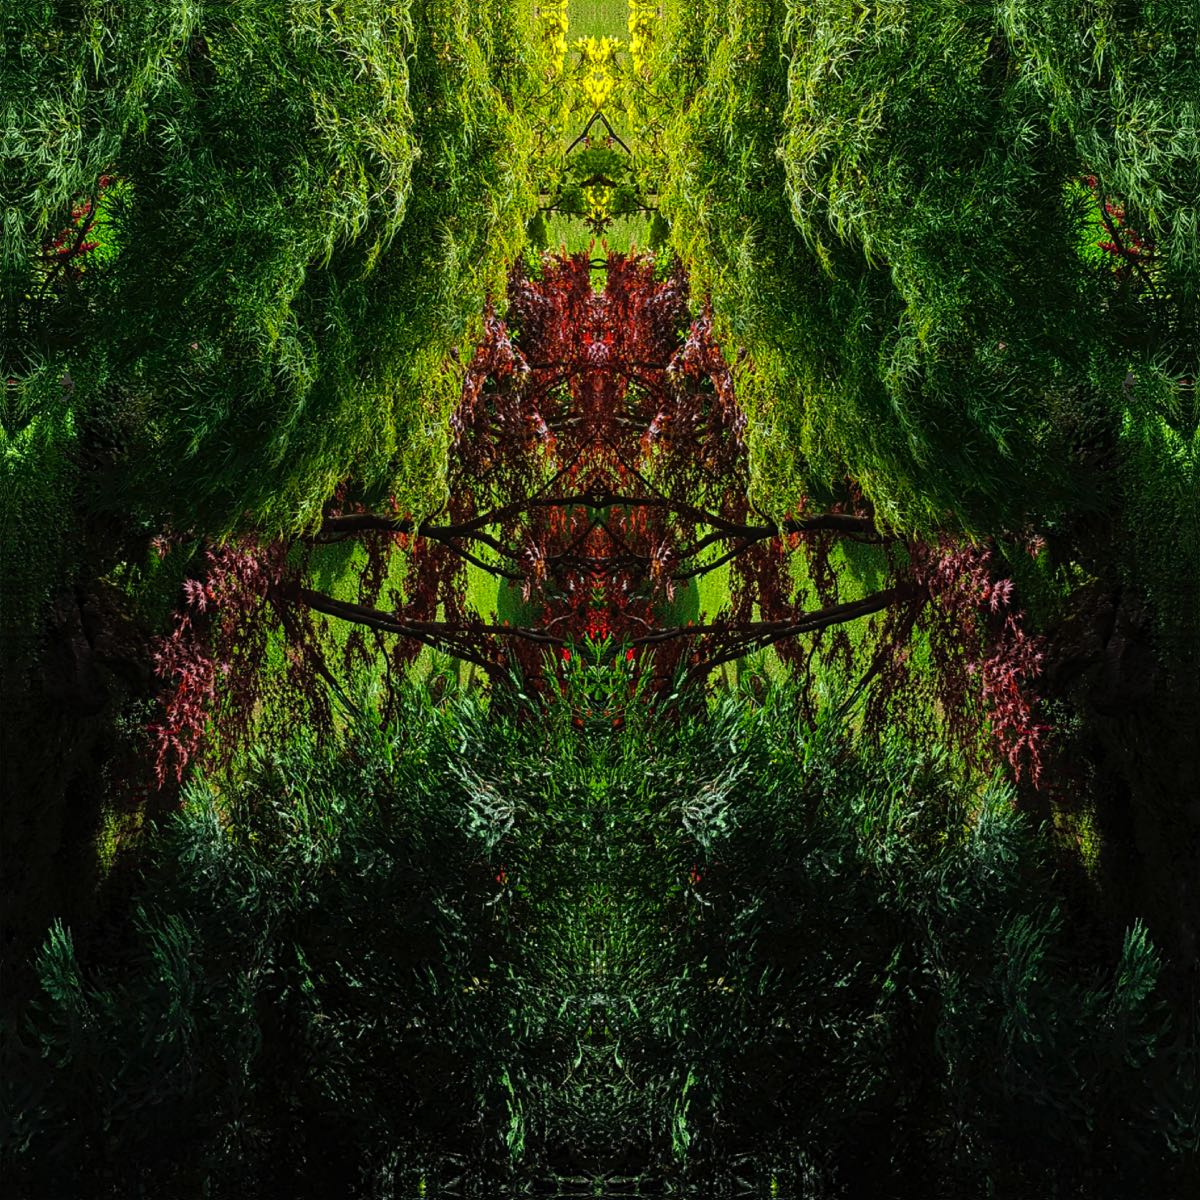 Subconscious - Tree Creatures #5 (40x40 cm) - Print on cotton paper 2020